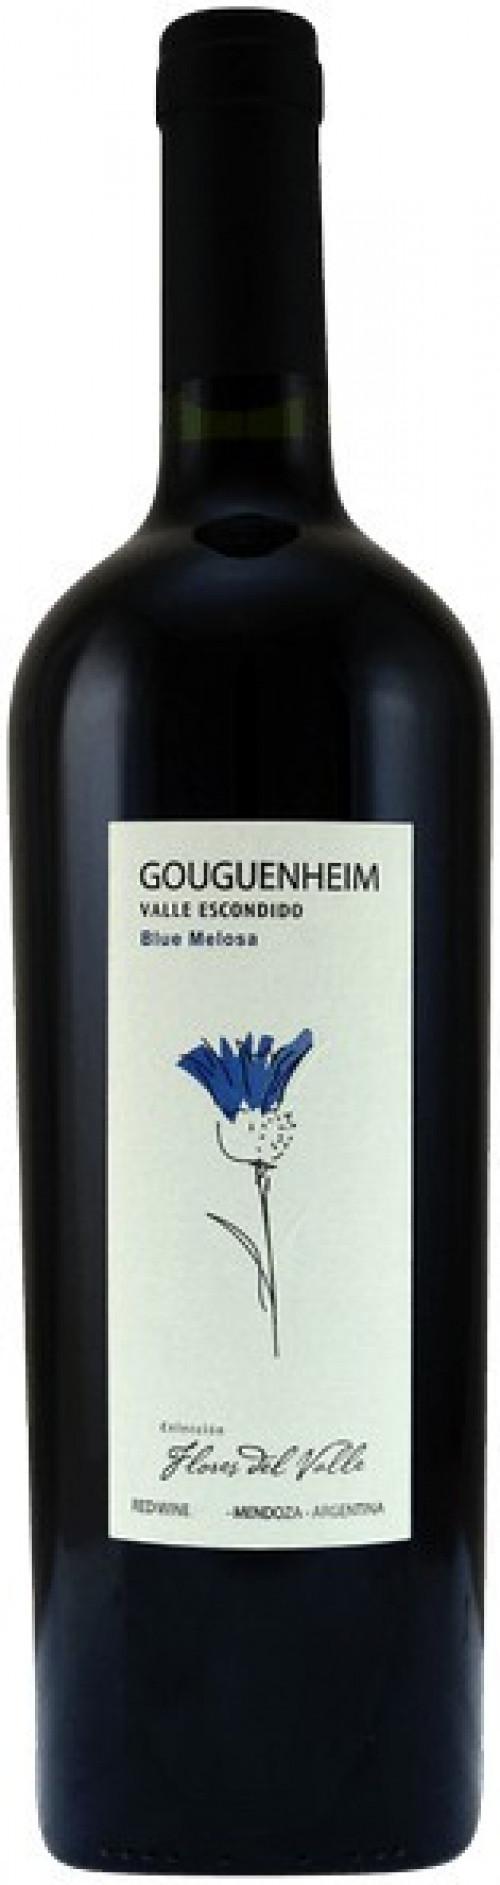 Gouguenheim Flores Blue Melosa Gran Reserva Malbec 750ml